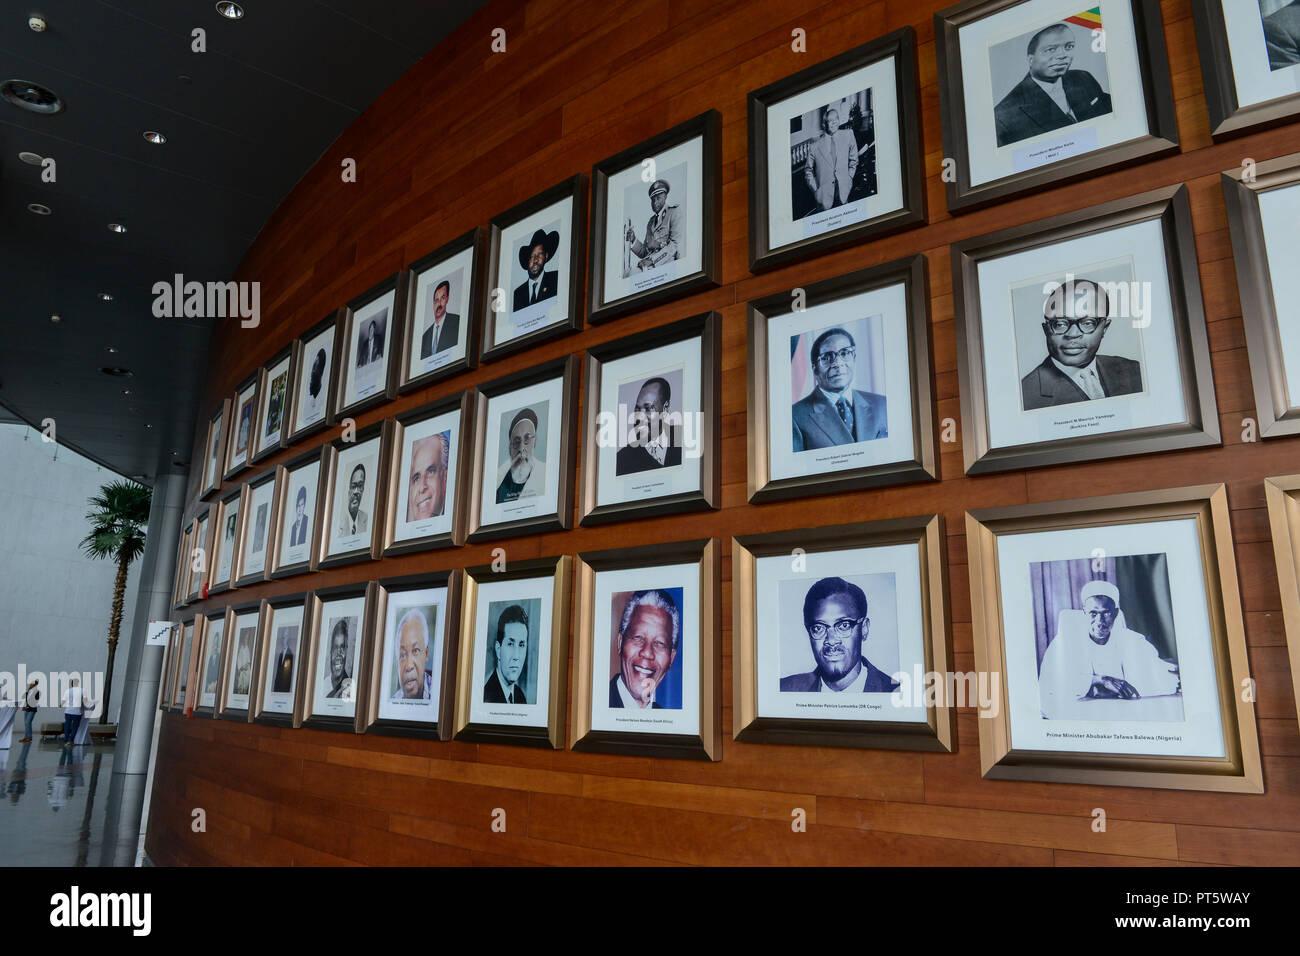 ETHIOPIA Addis Ababa, AU African Union building, wall with photos of african presidents and PM ie Nelson Mandela, Salvar Kiir Mayardit, Patrice Lumumba, Robert Mugabe / AETHIOPIEN, Addis Abeba, Gebaeude der AU Afrikanischen Union, Foyer mit Fotos afrikanischer Praesidenten und Premierminister - Stock Image